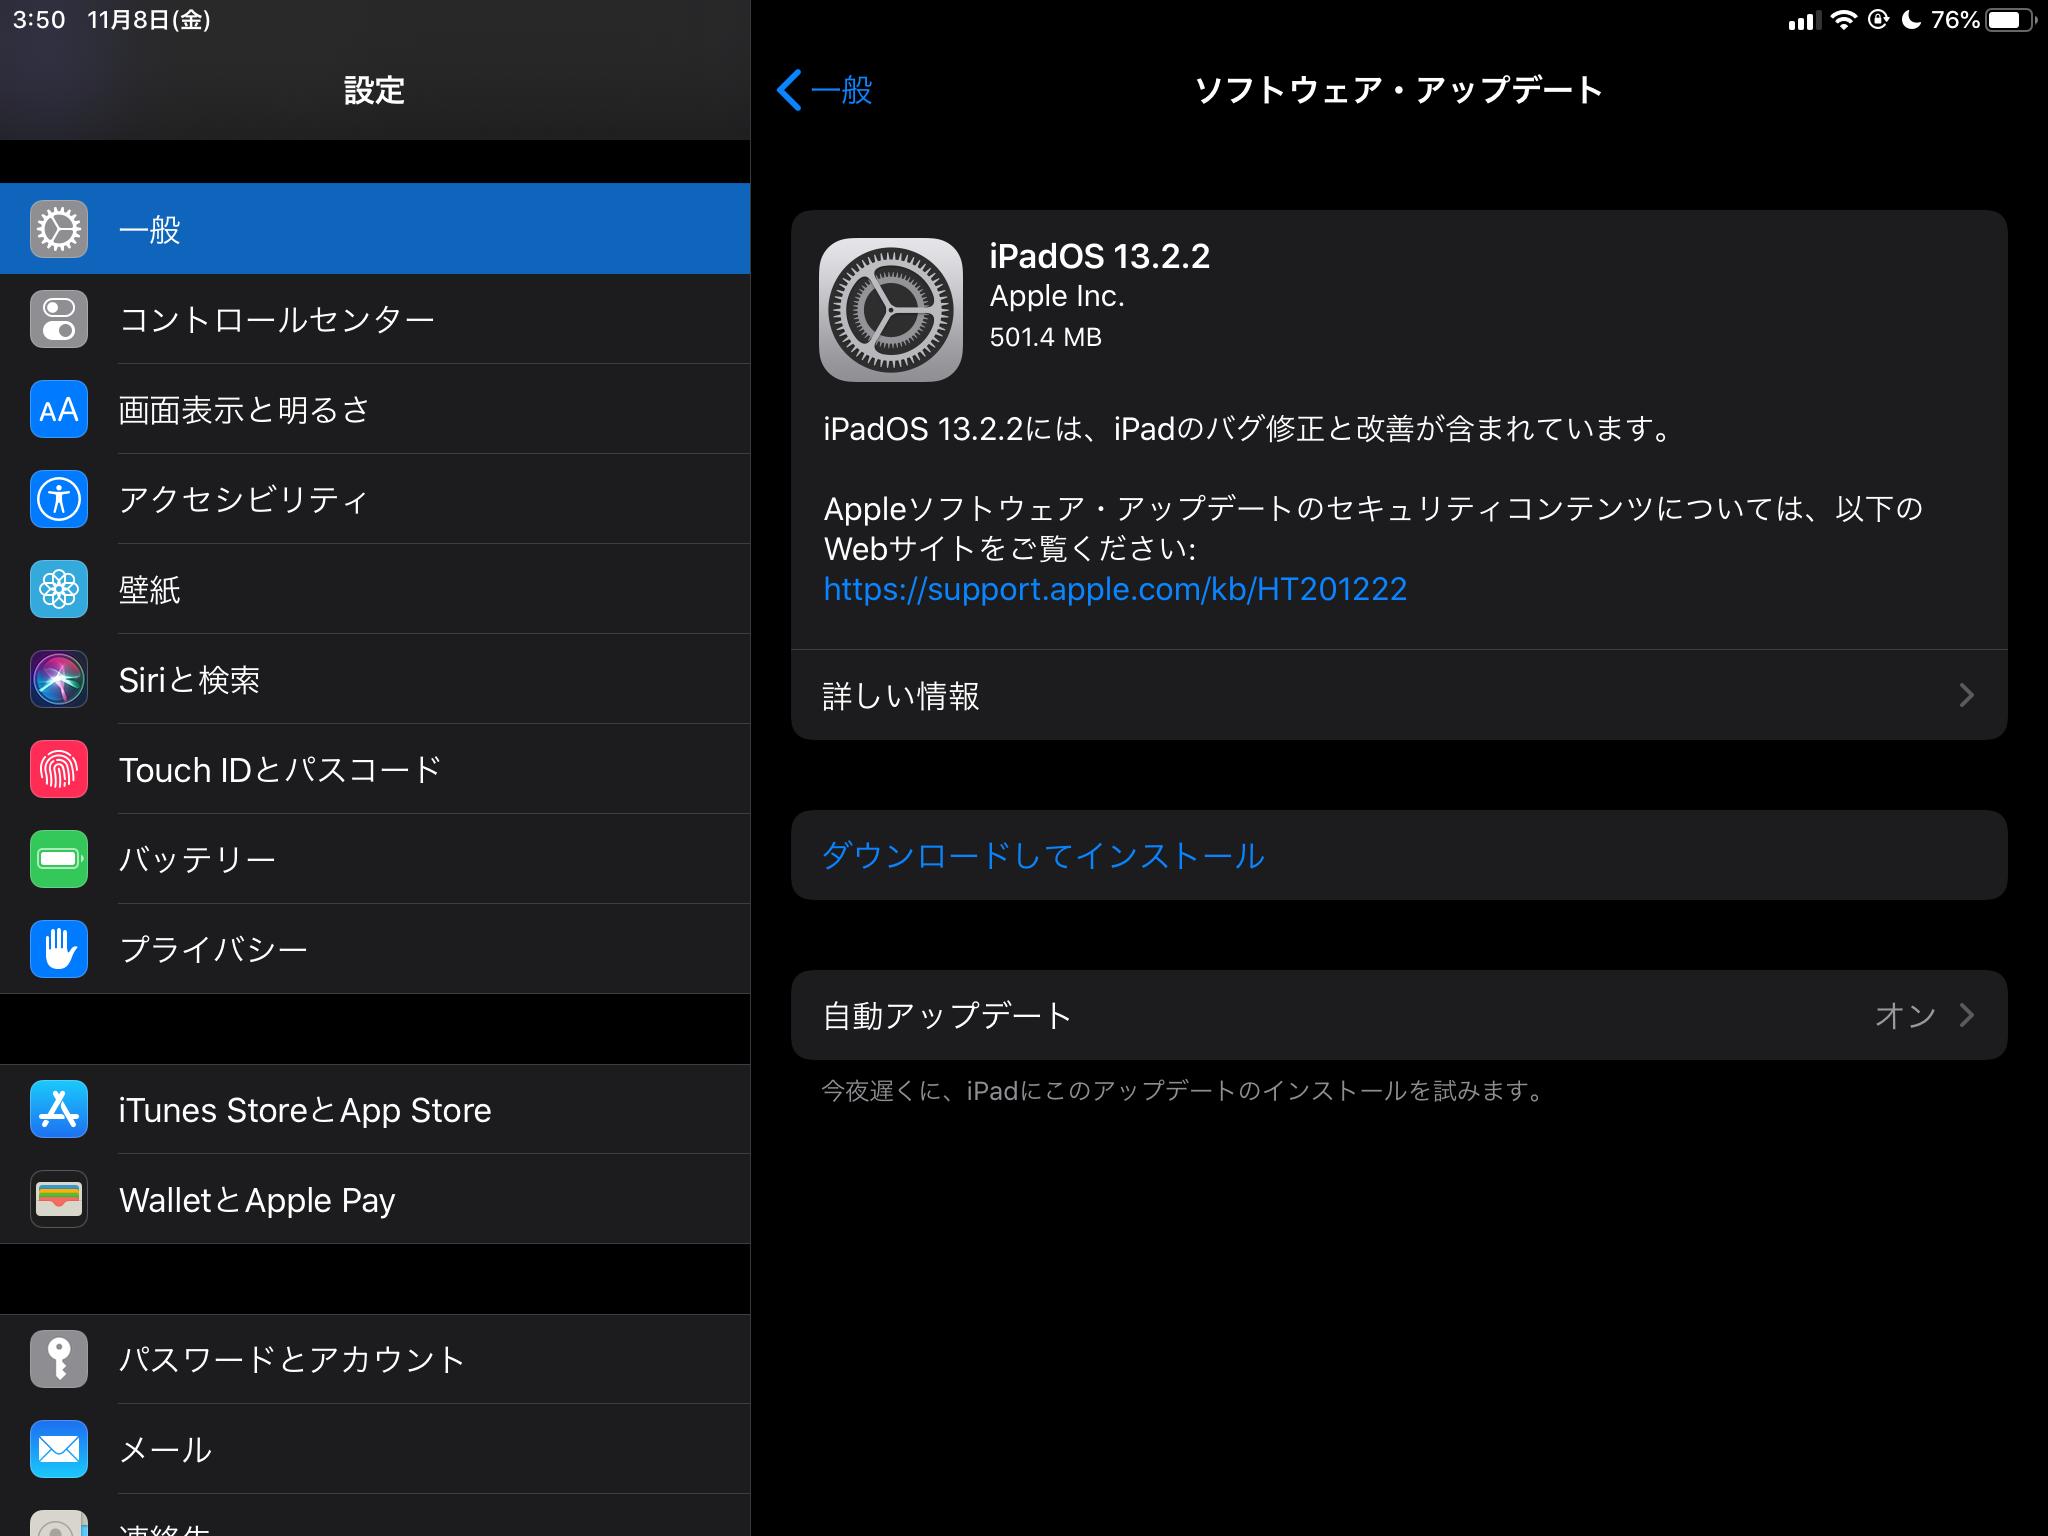 Apple、「iOS 13.2.2」および「iPadOS 13.2.2」を公開